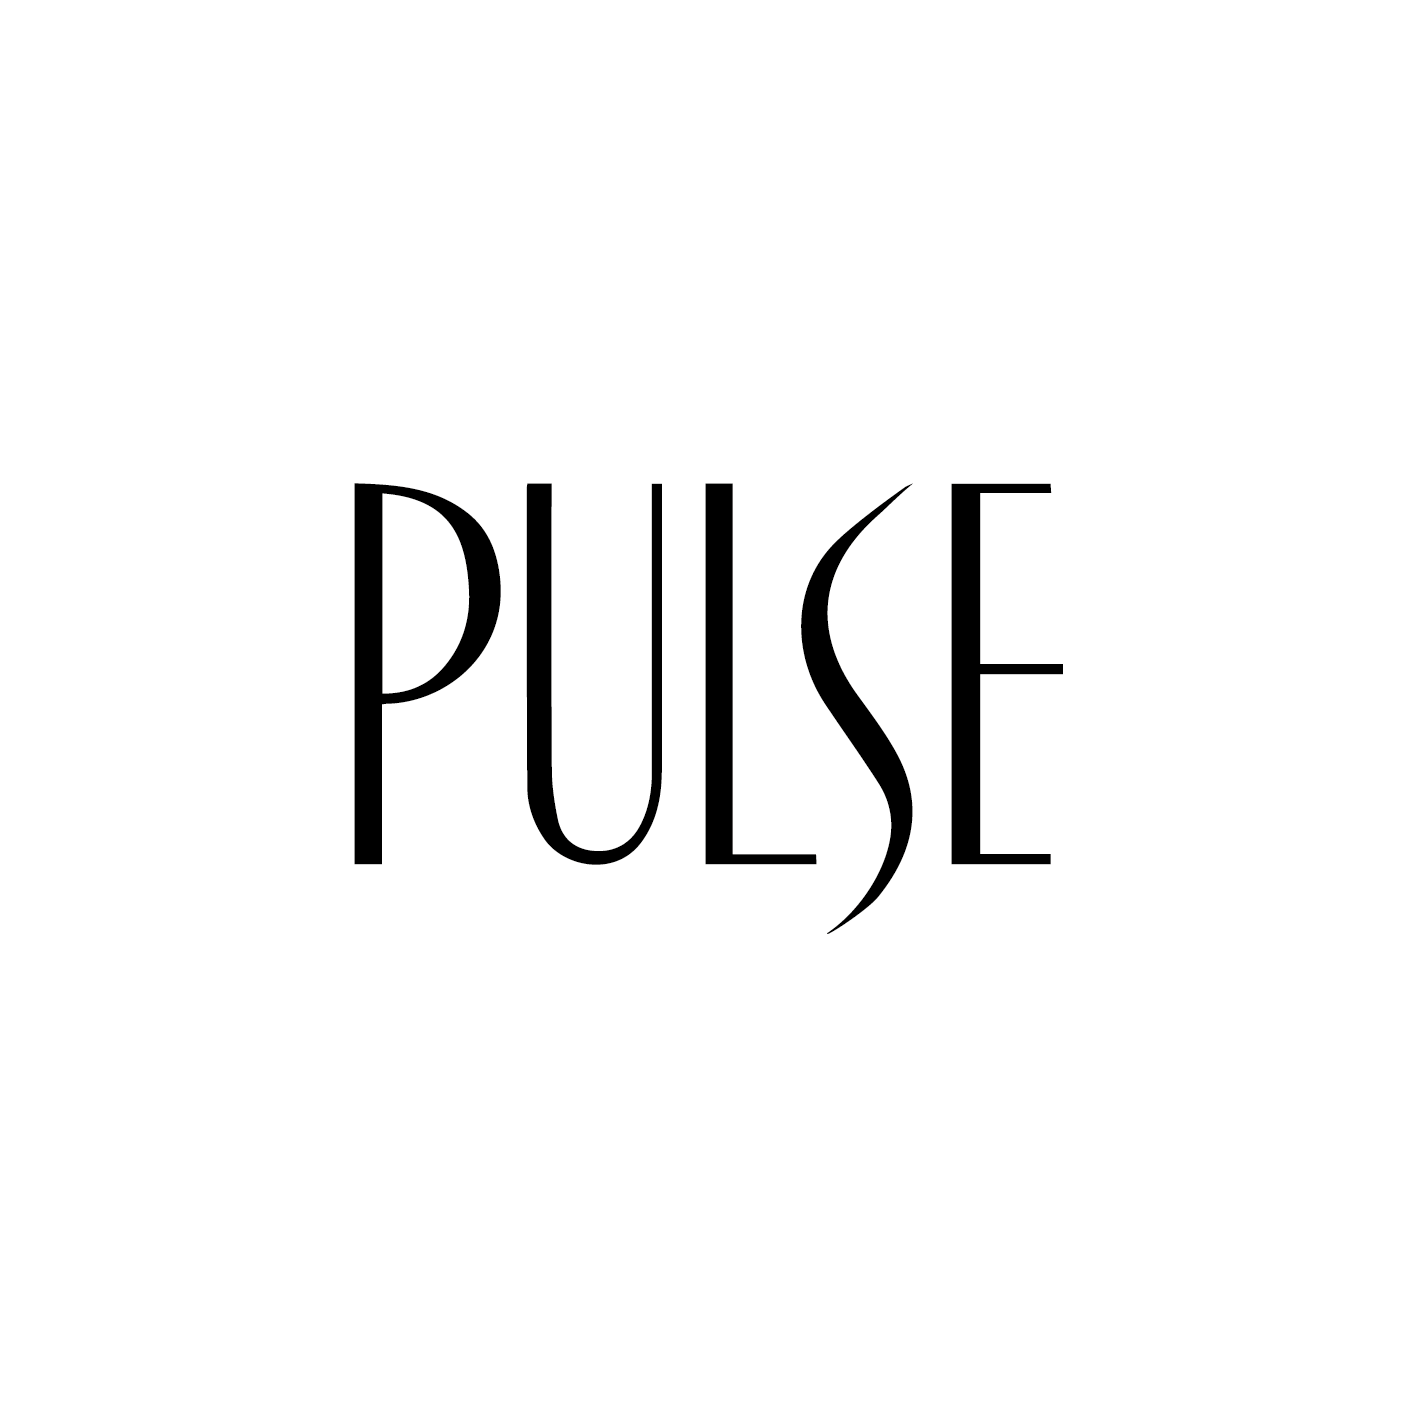 PulsePlan de travail 1.png